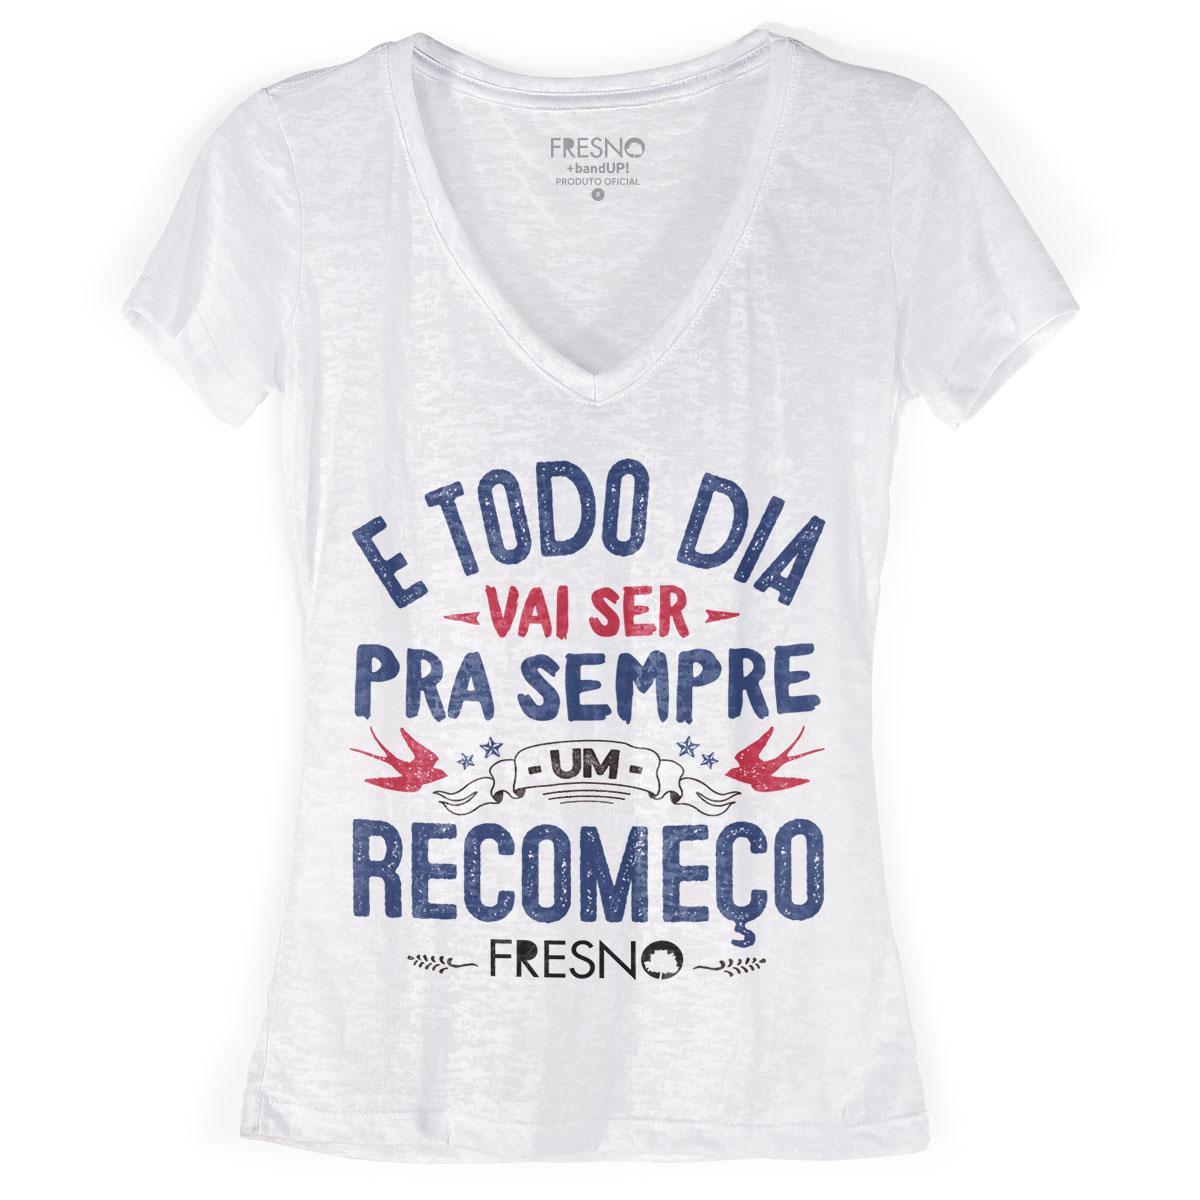 Camiseta Devorê Feminina Fresno Acordar